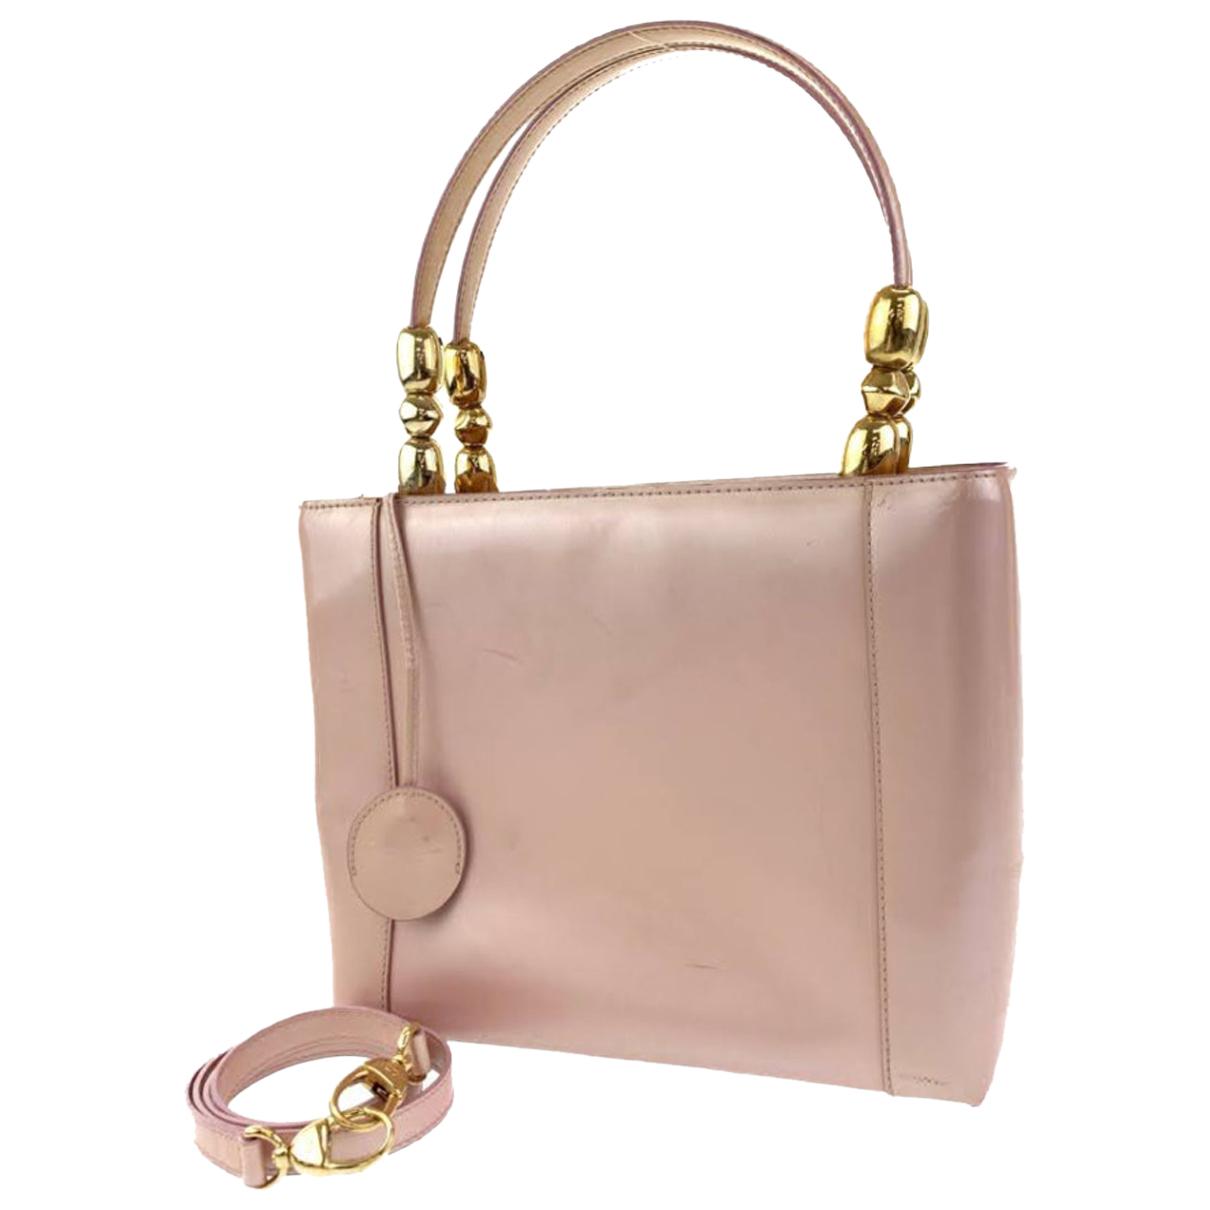 Christian Dior N Patent leather handbag for Women N